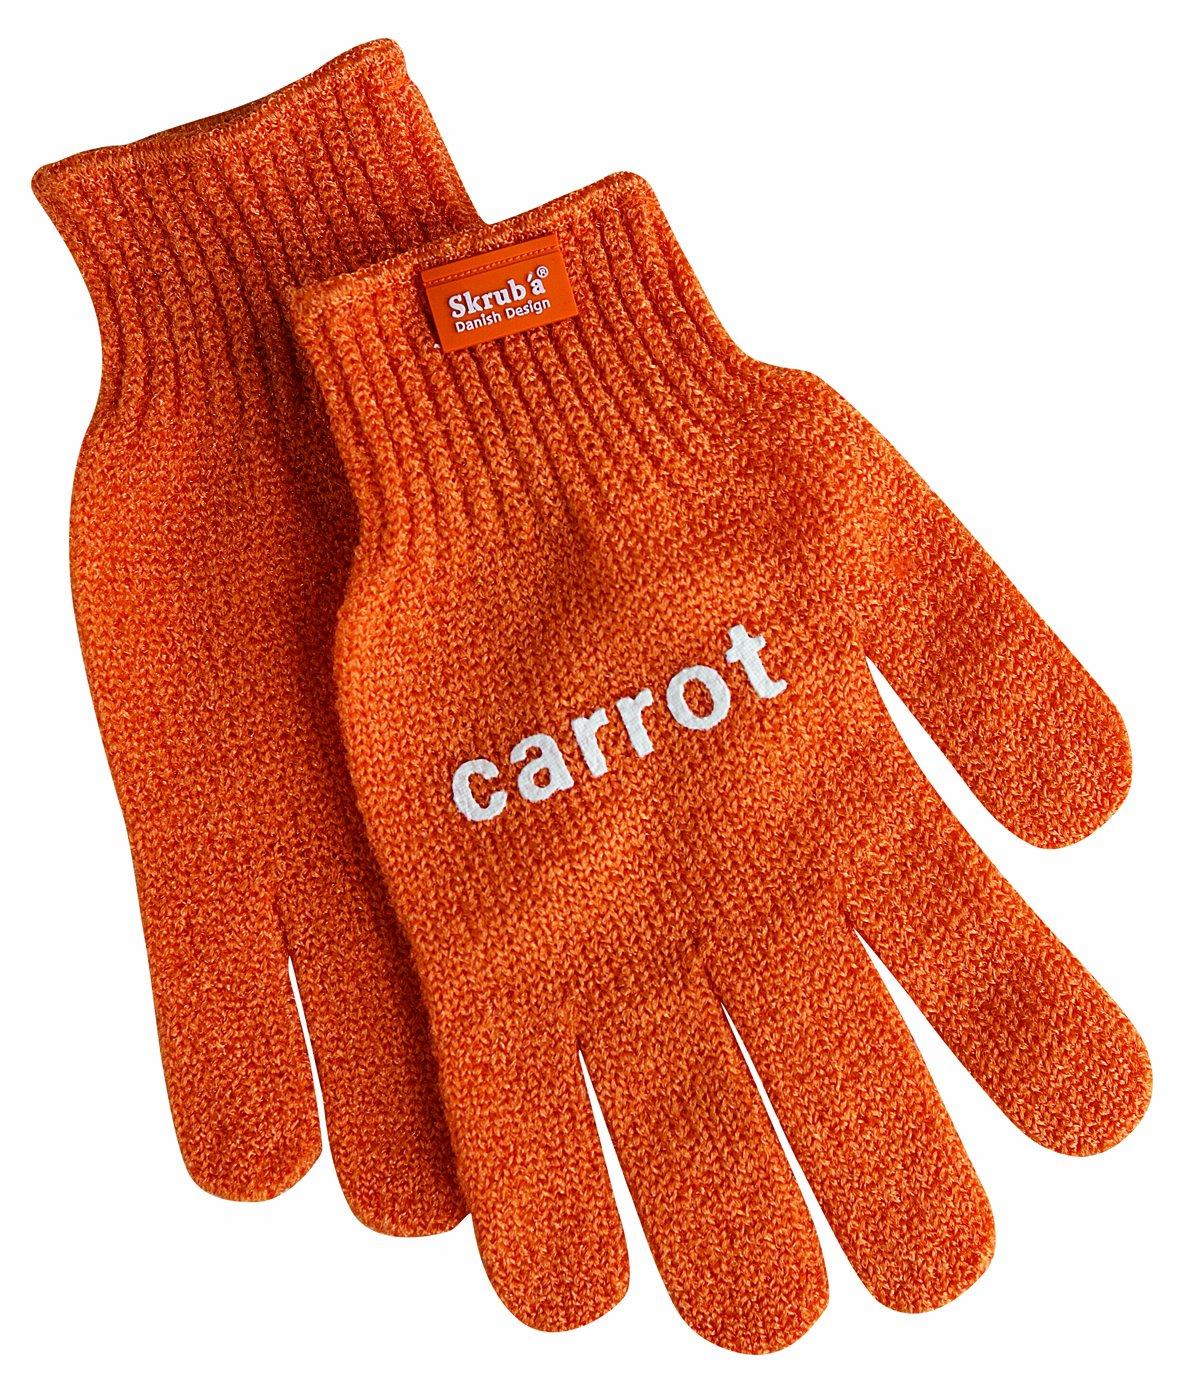 Eddingtons Skrub'a Guanti pulisci carote 671003